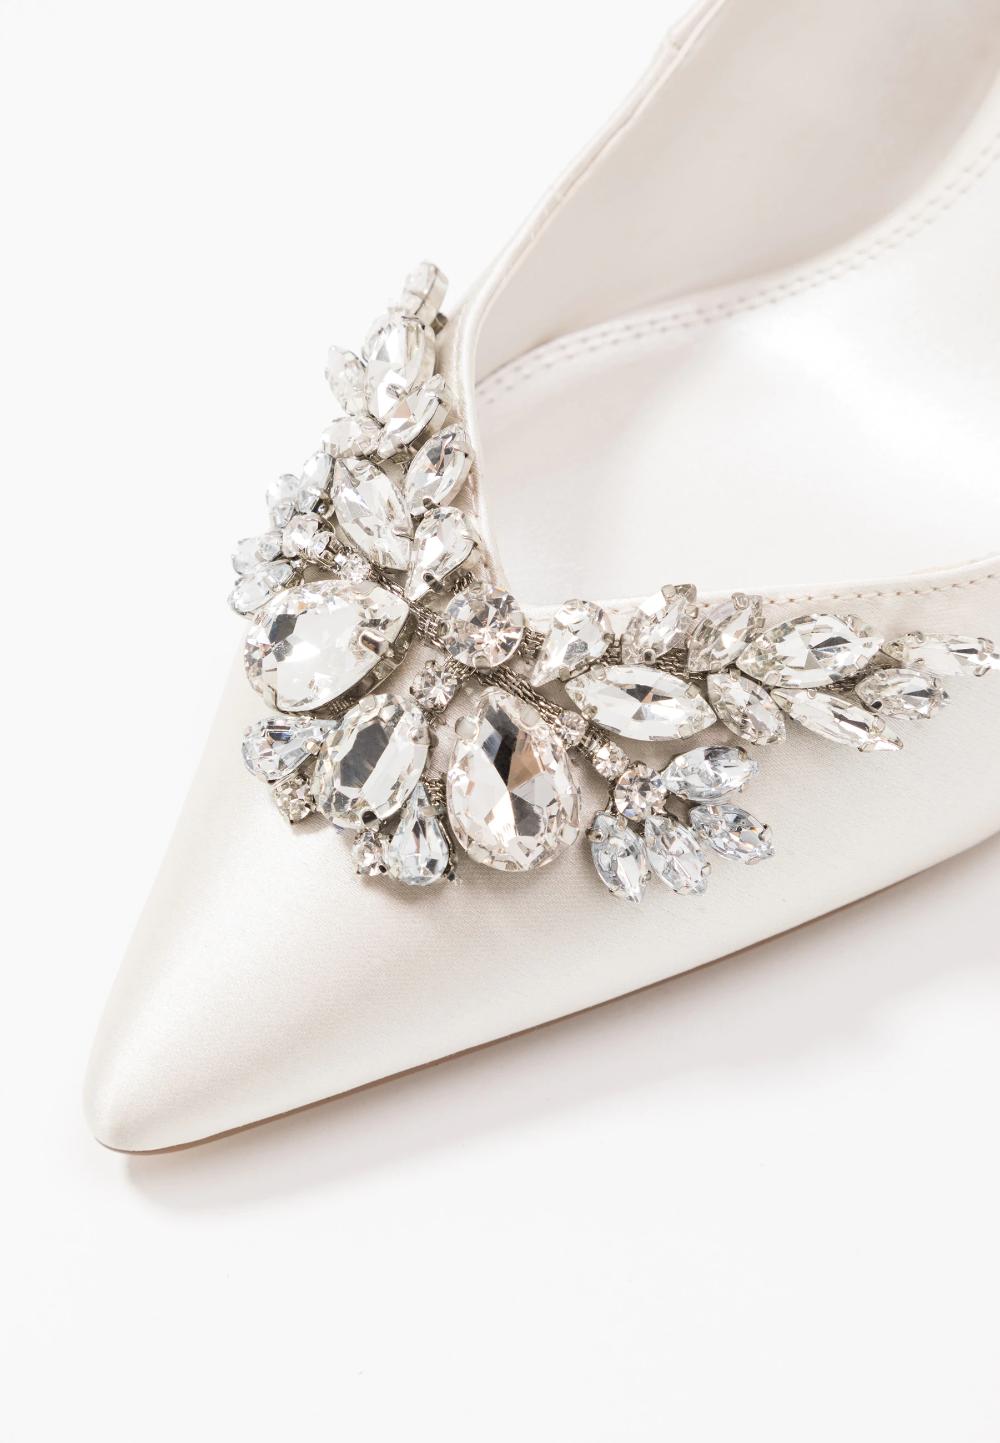 Bels Bridal Shoes Ivory Zalando Co Uk In 2020 Bridal Shoes Ivory Bridal Shoes Ivory Wedding Shoes